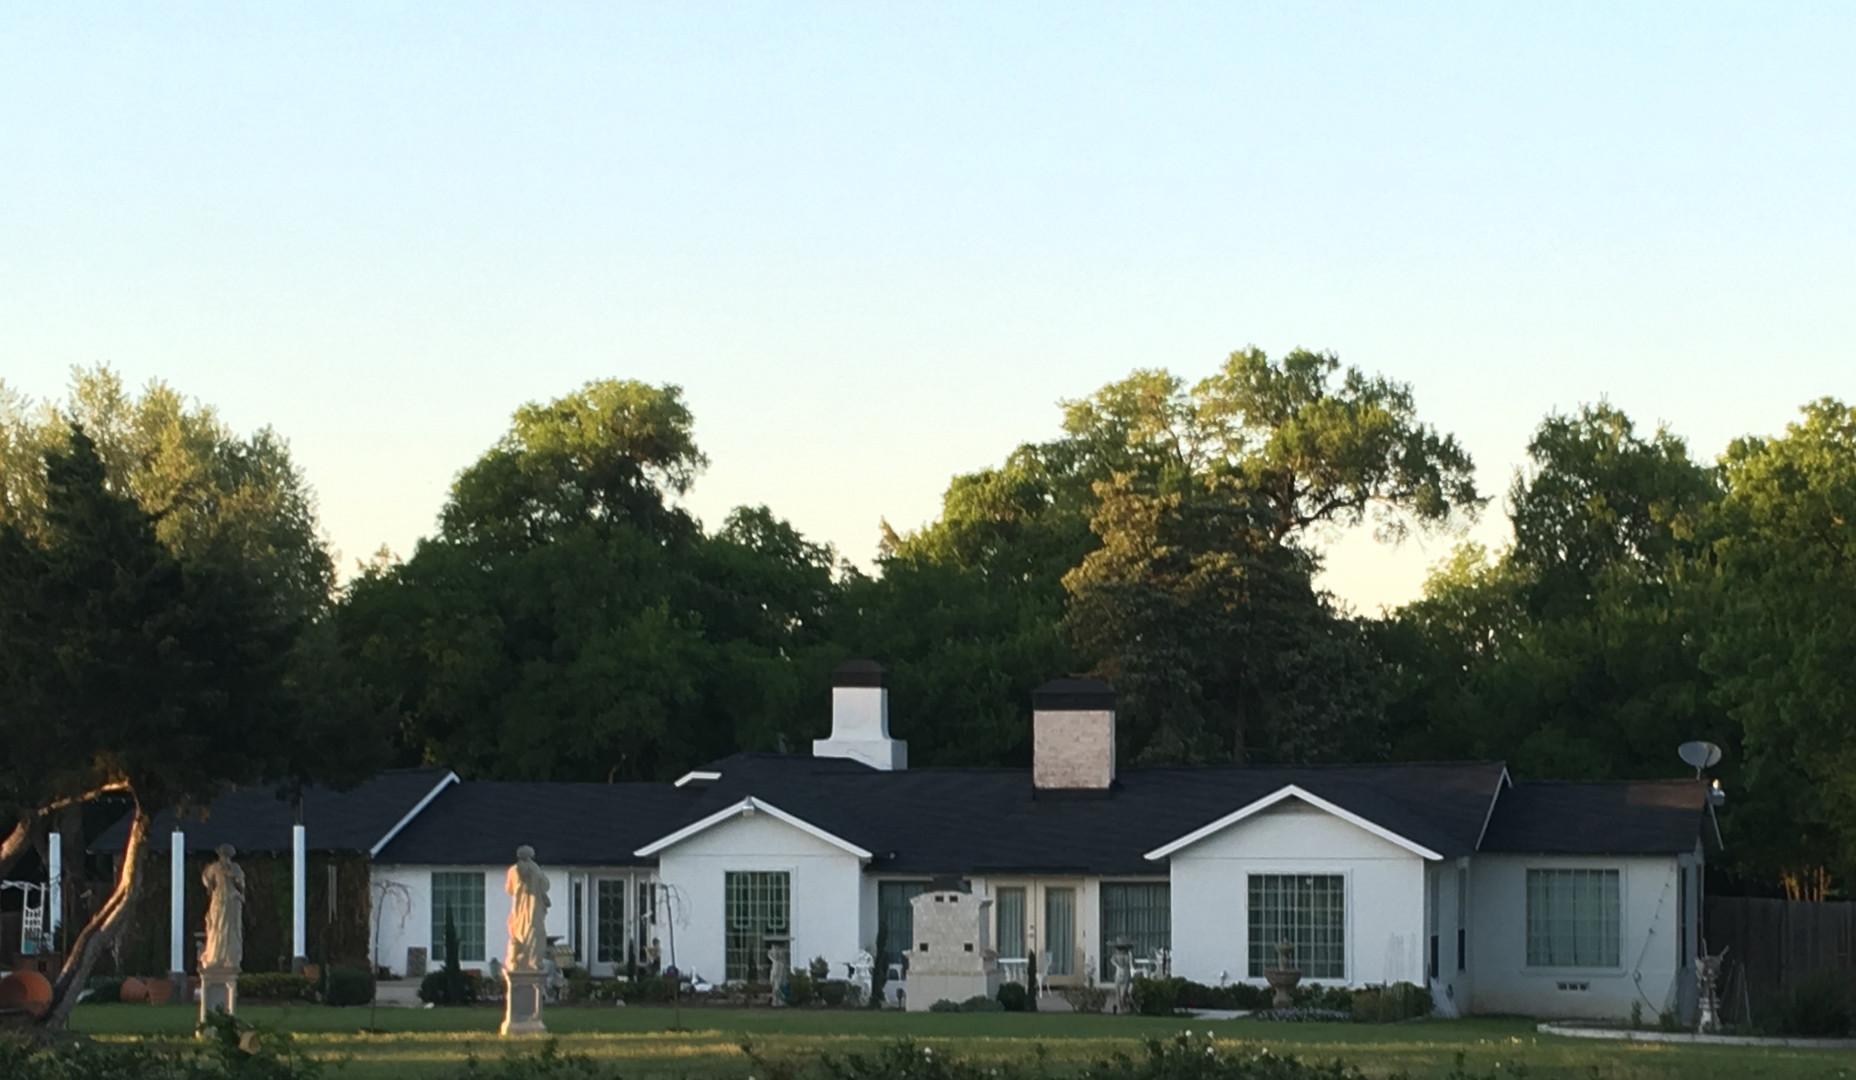 New roof | Trim | Masonry